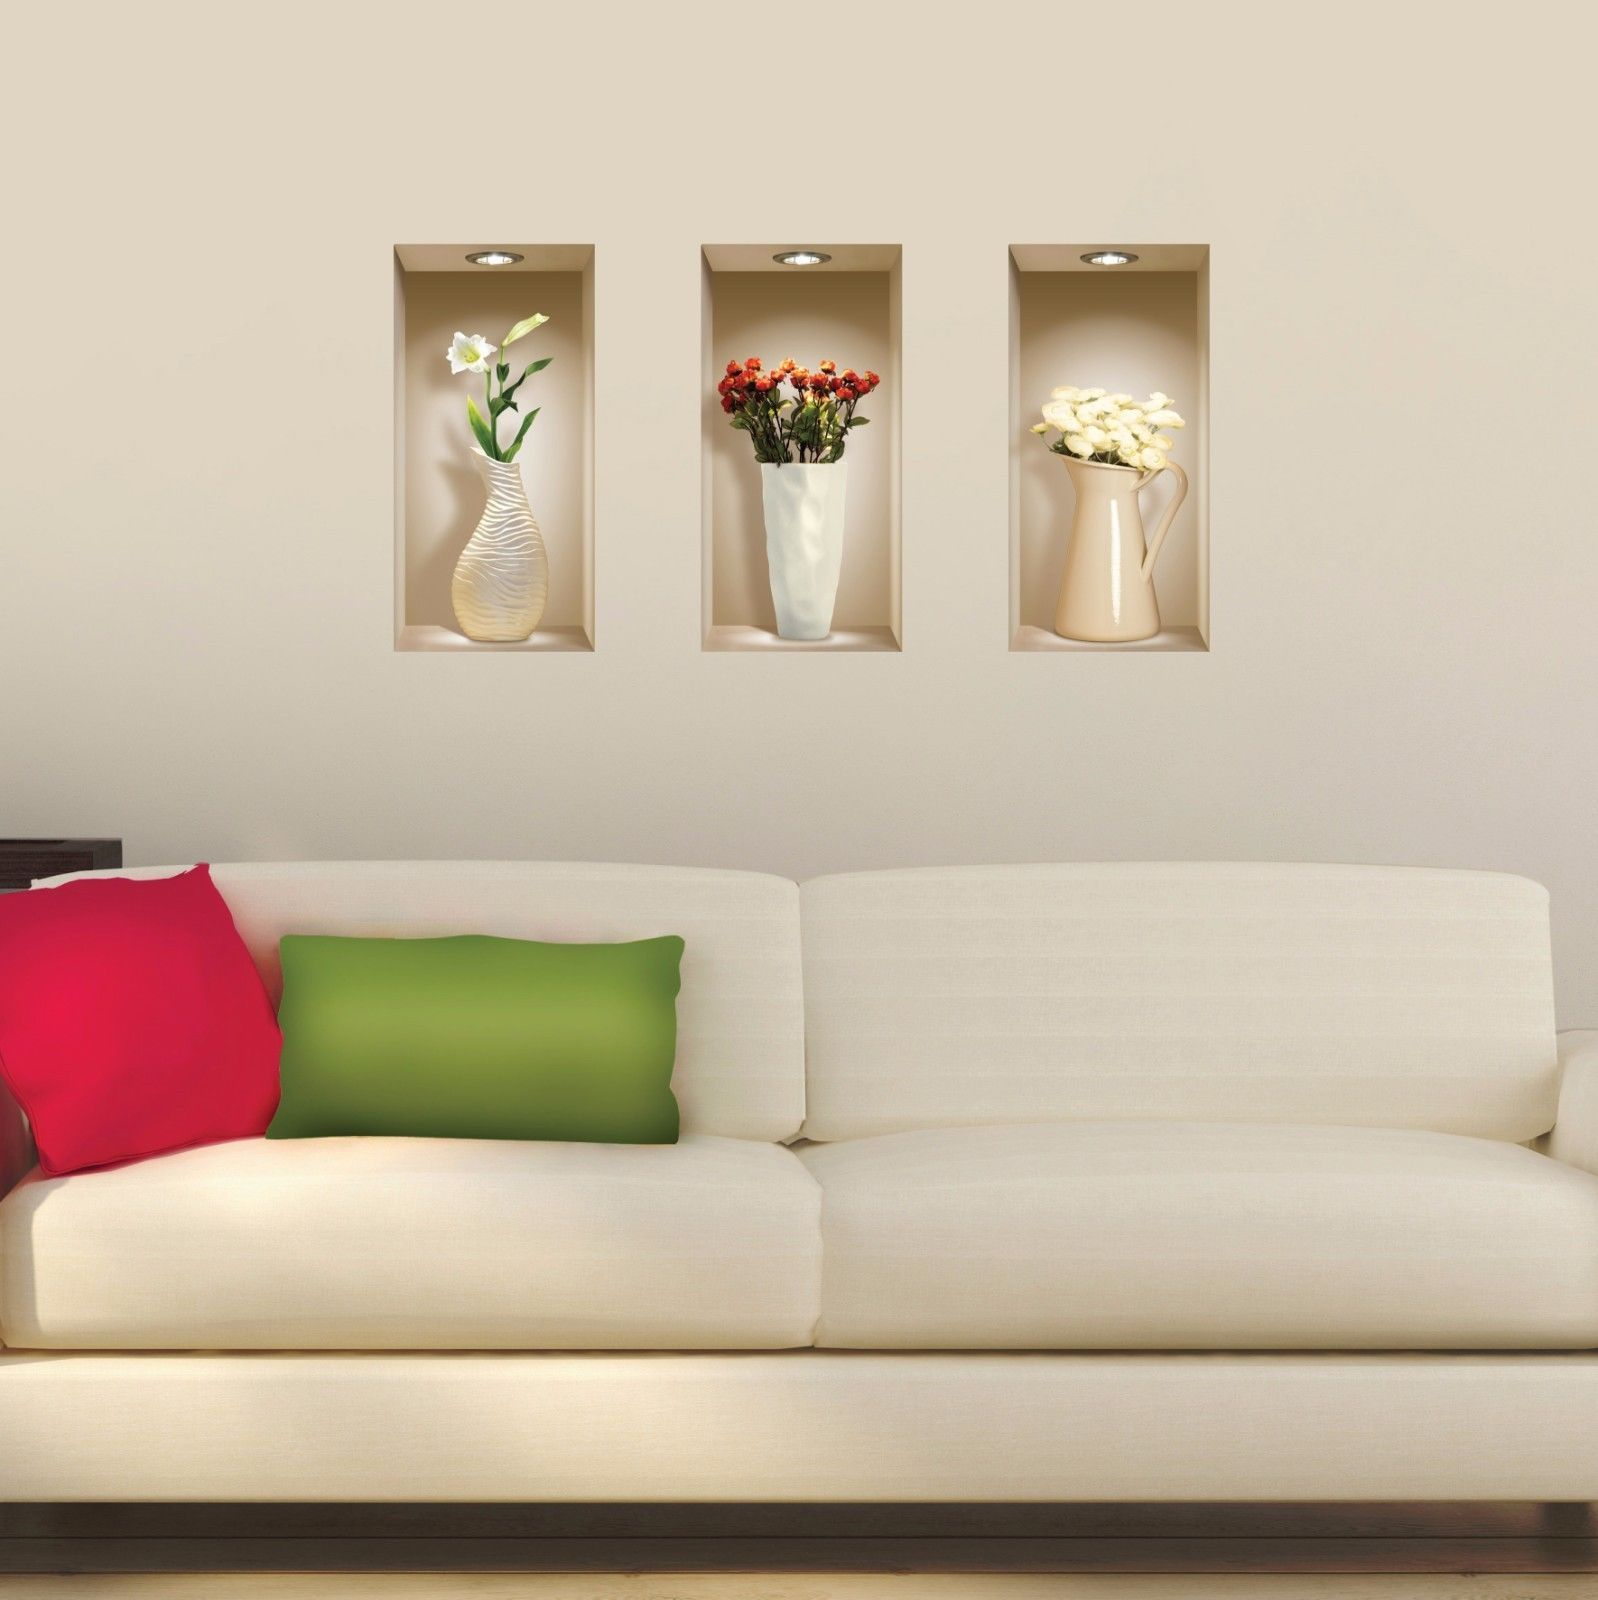 Set art wall stickers magic d picture vinyl removable tile decals